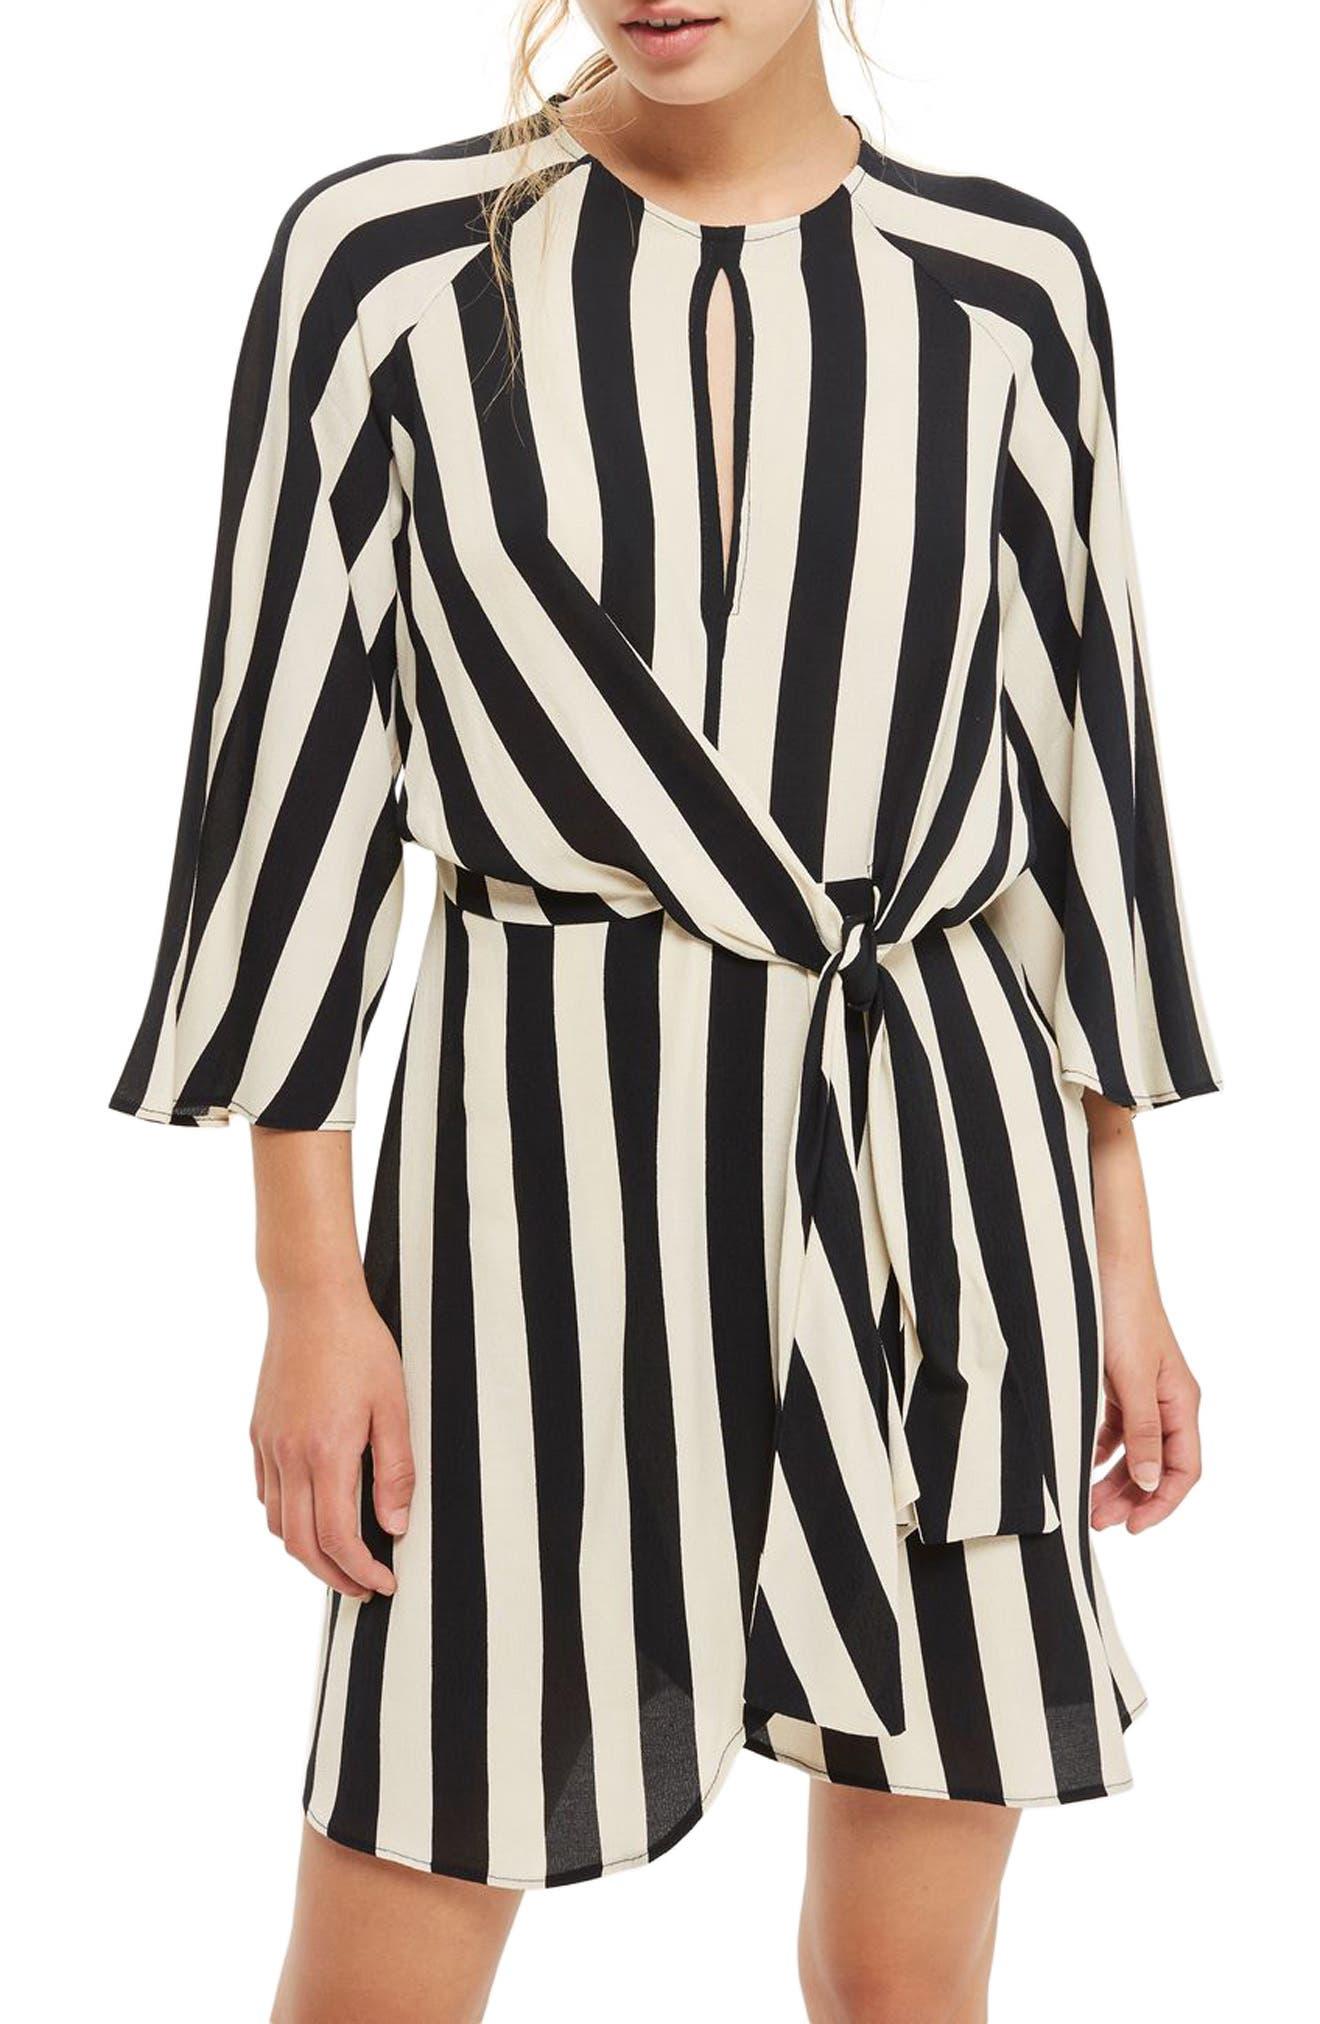 Humbug Stripe Knot Dress,                         Main,                         color, 001